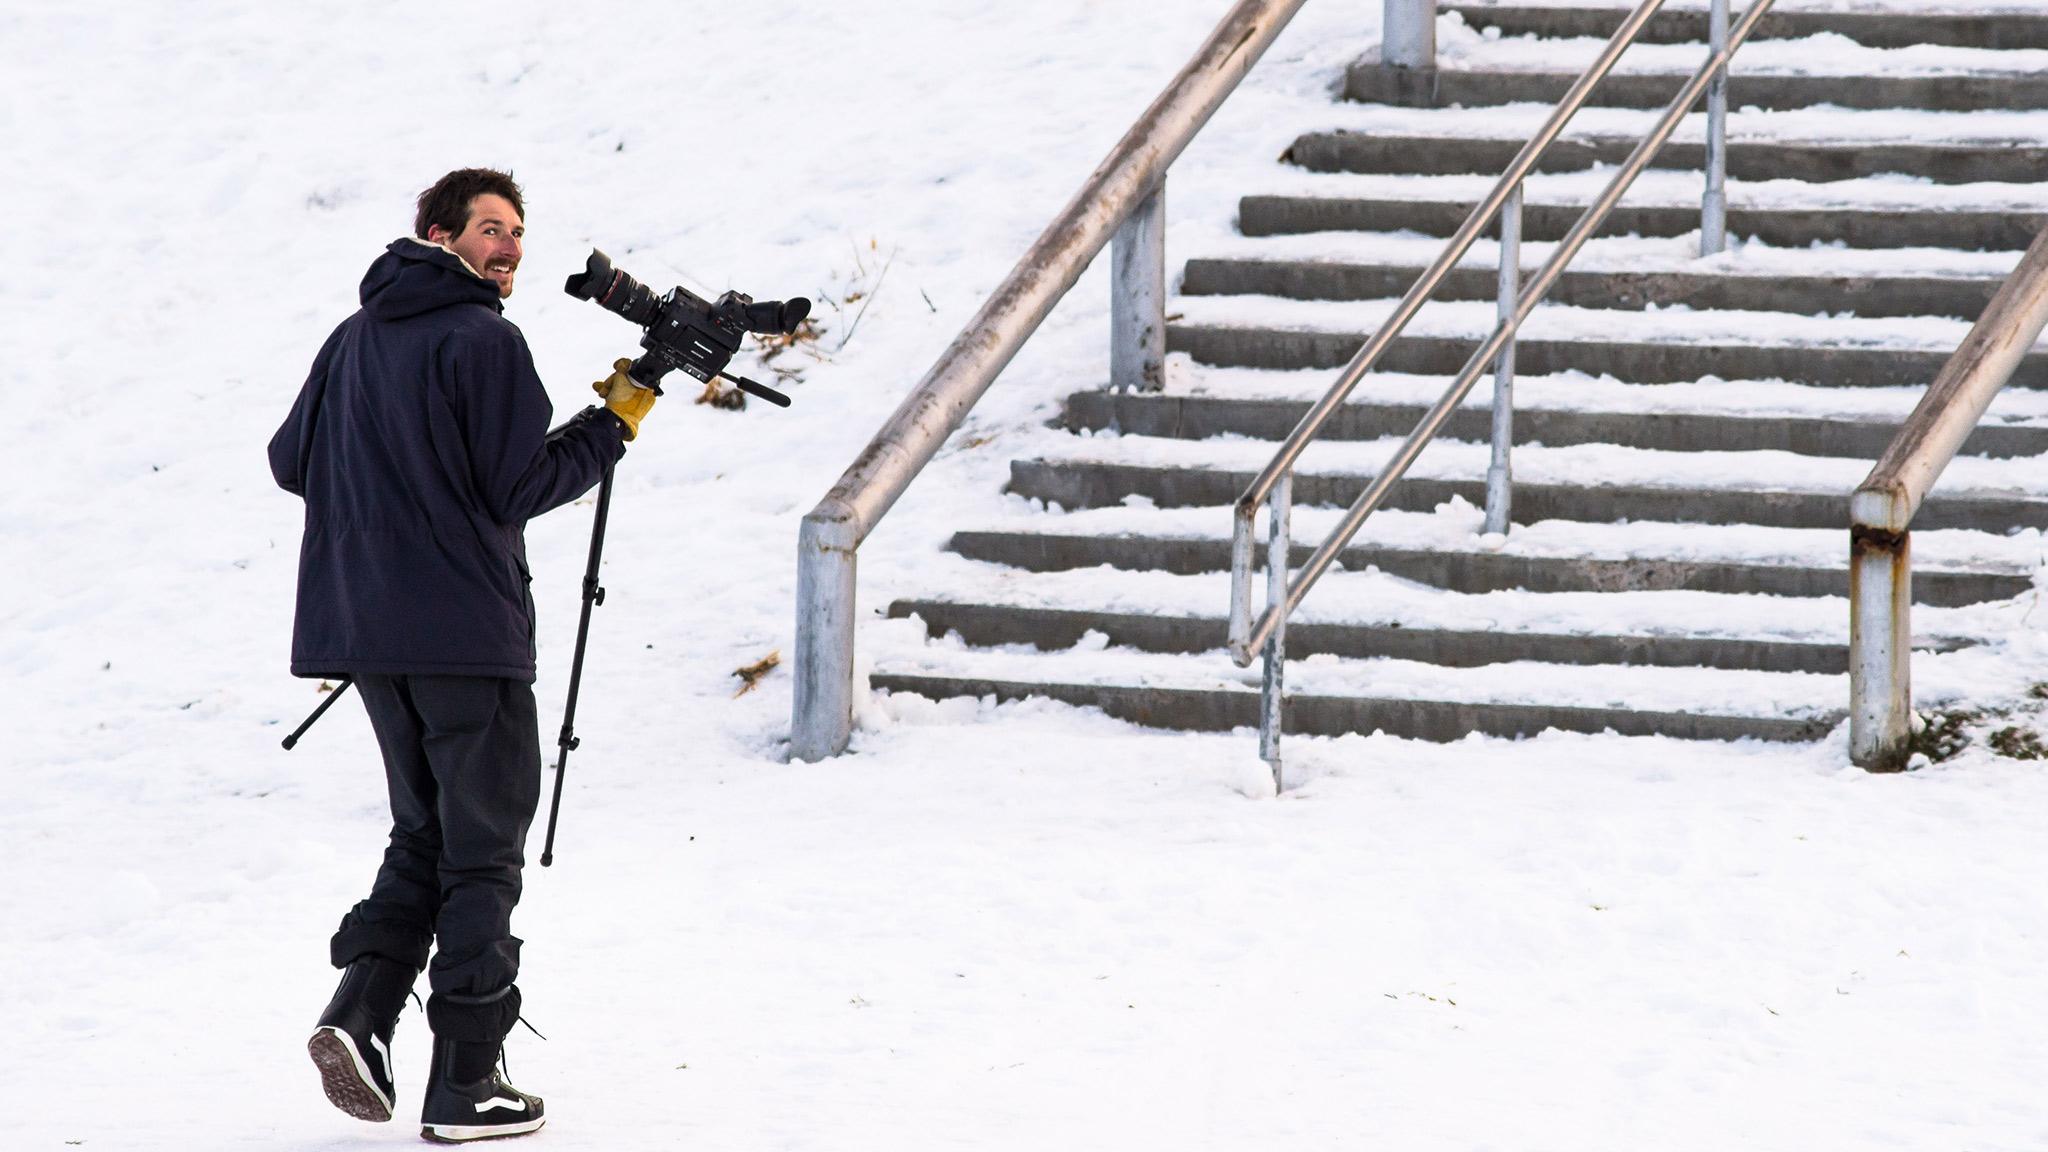 Paul's filming teammate: Colton Morgan